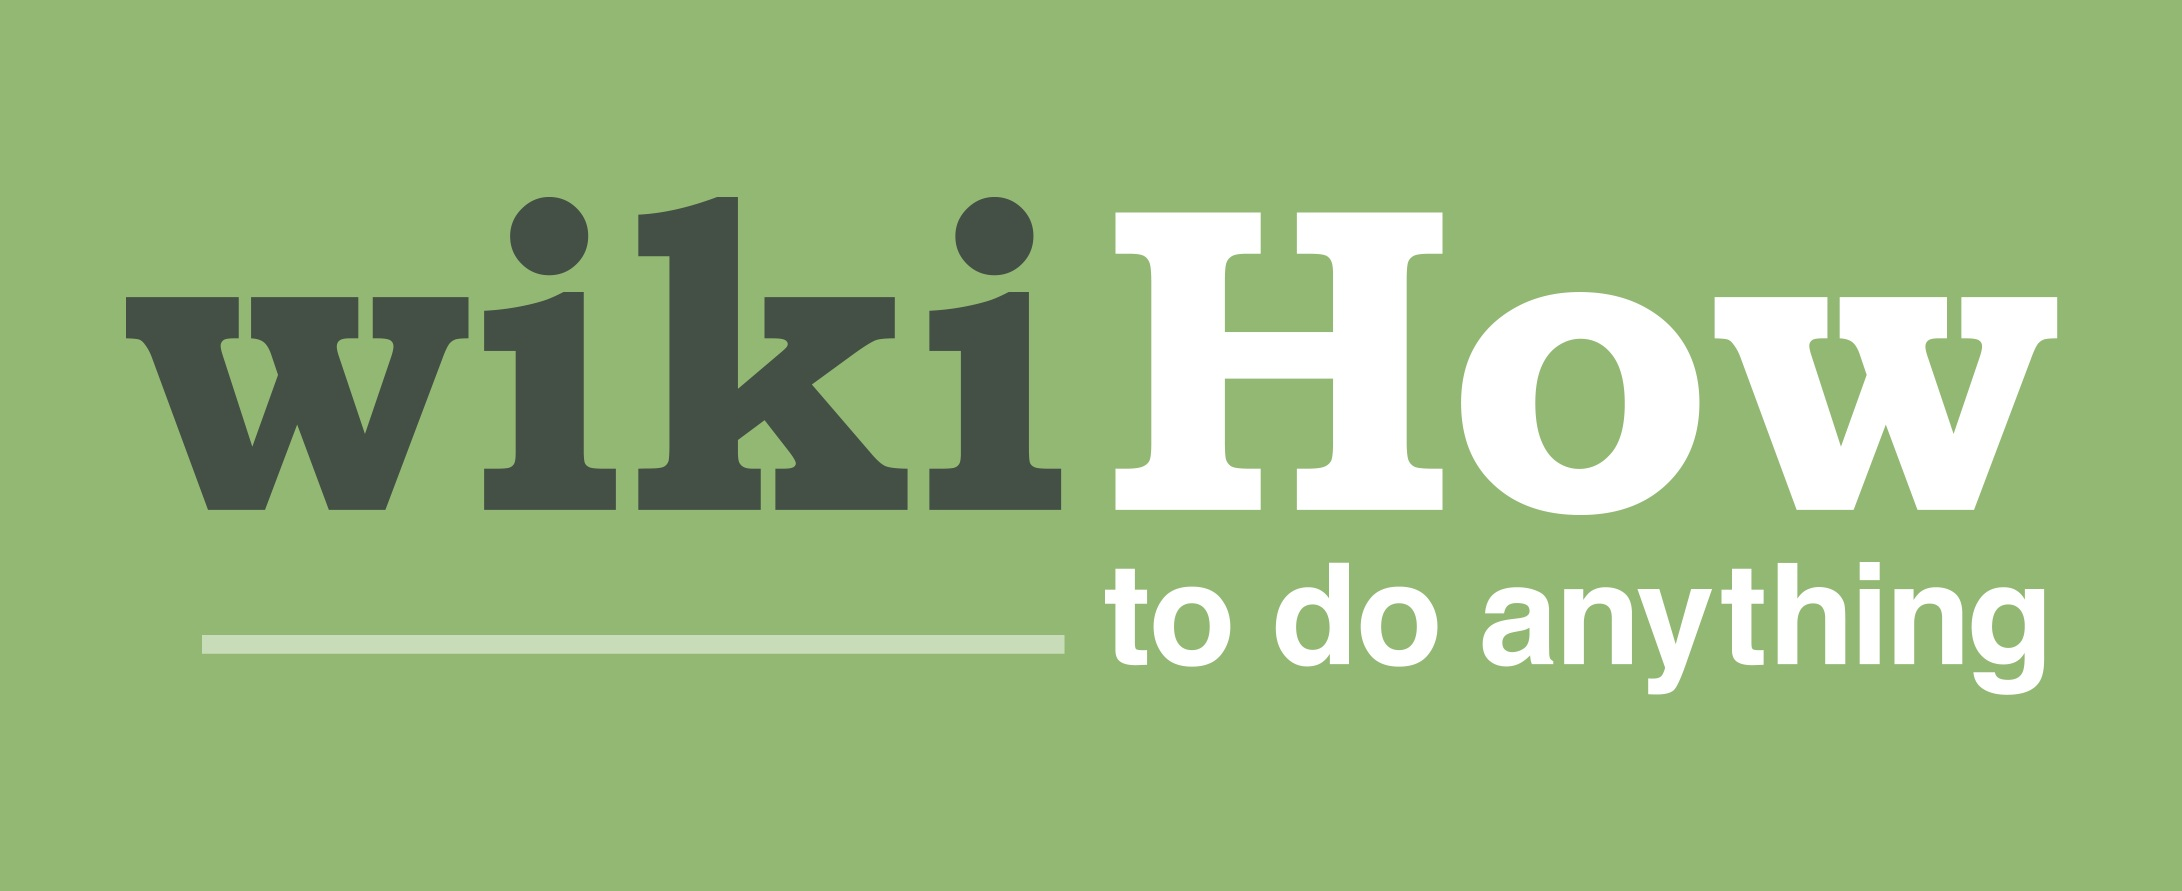 WikiHow_logo.jpg